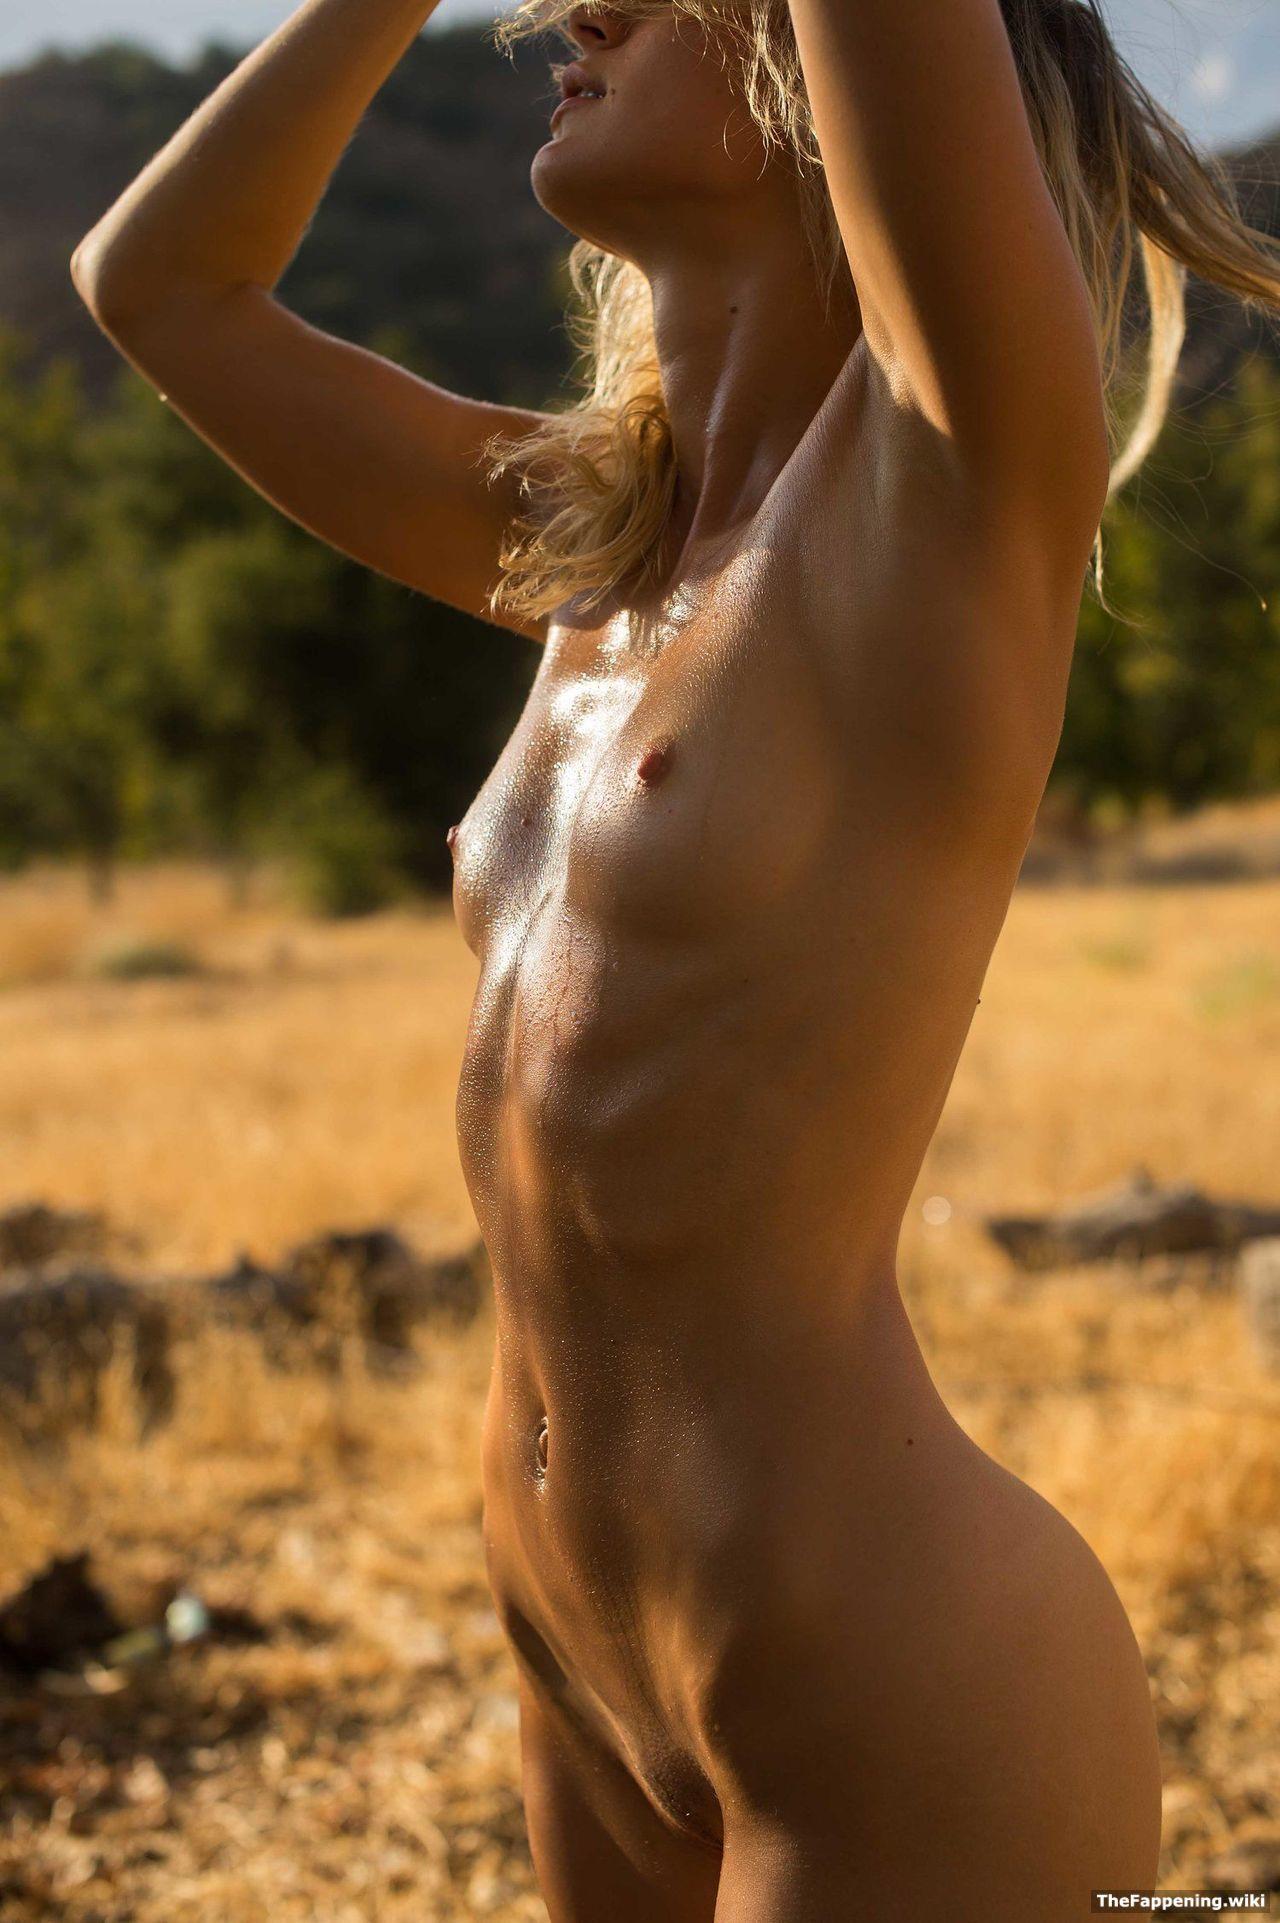 lauren bonner nude pics vids the fappening